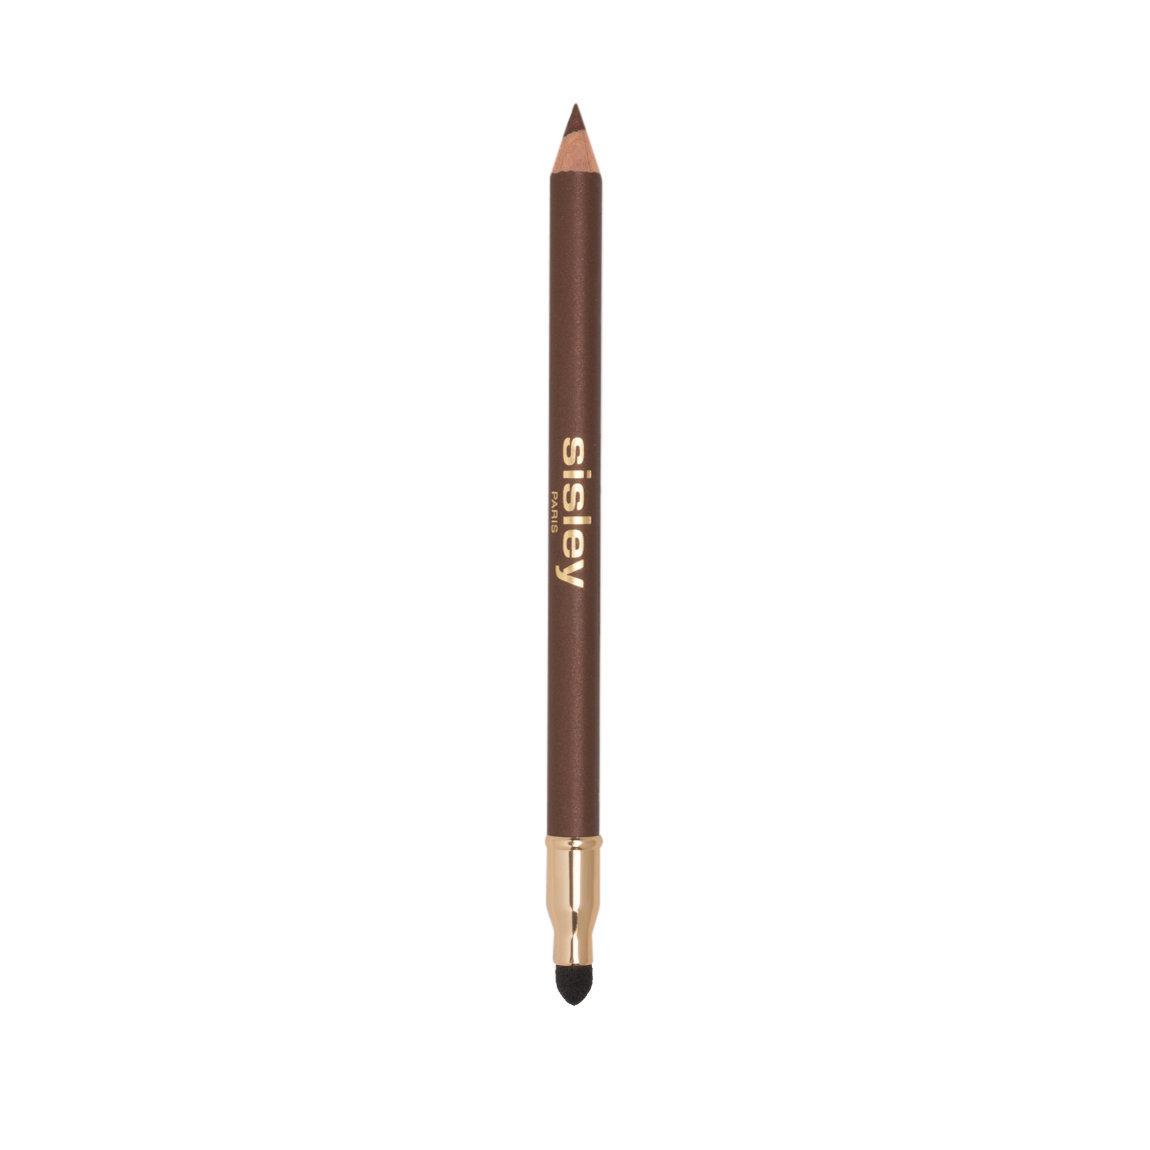 Sisley-Paris Phyto-Khol Perfect Eyeliner 2 Brown alternative view 1.